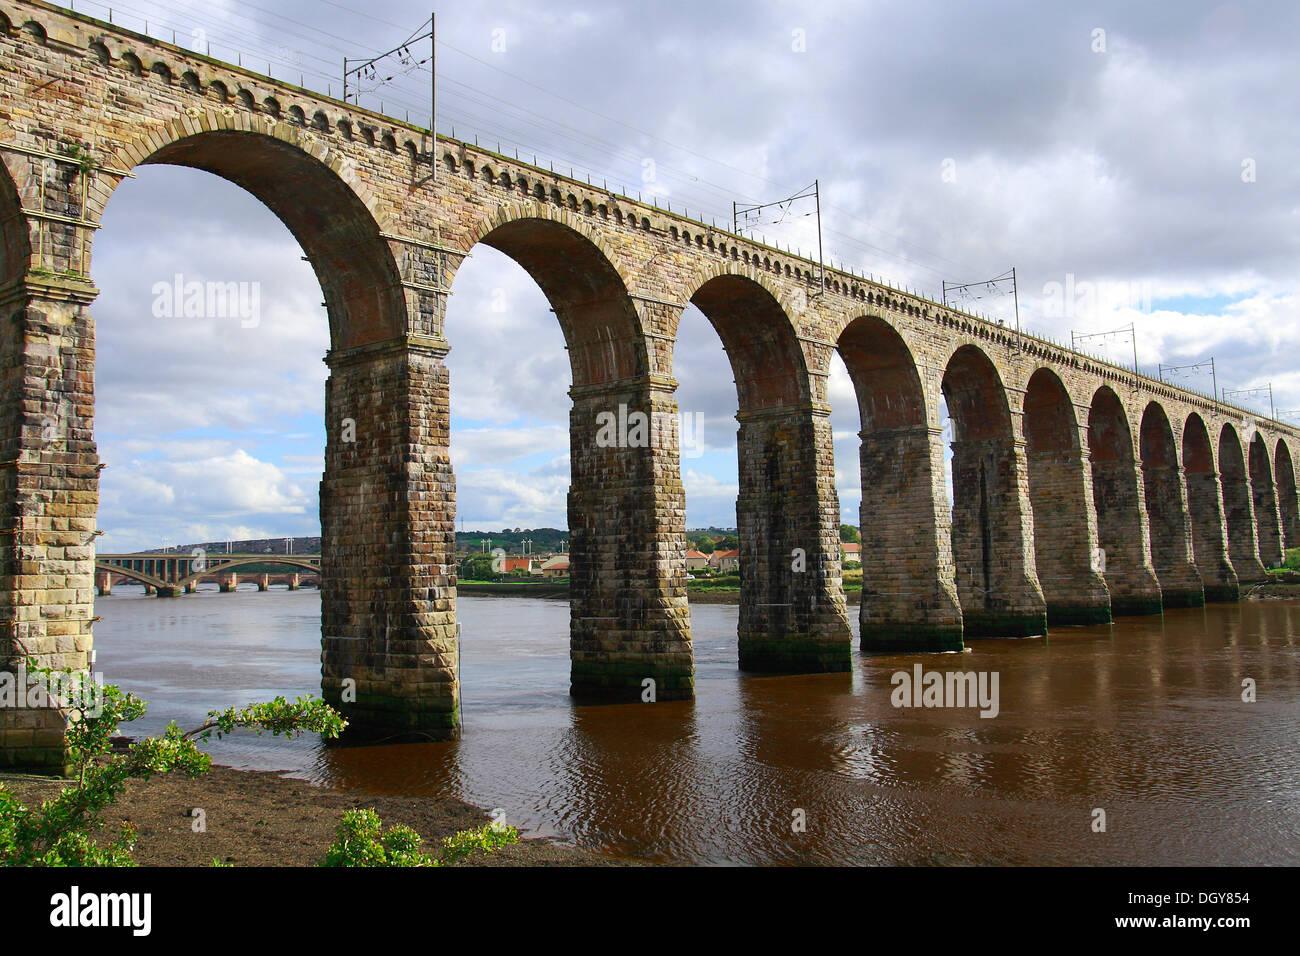 Railway bridge, stone bridge, River Tweed, Berwick-upon-Tweed, Scotland, United Kingdom, Europe - Stock Image